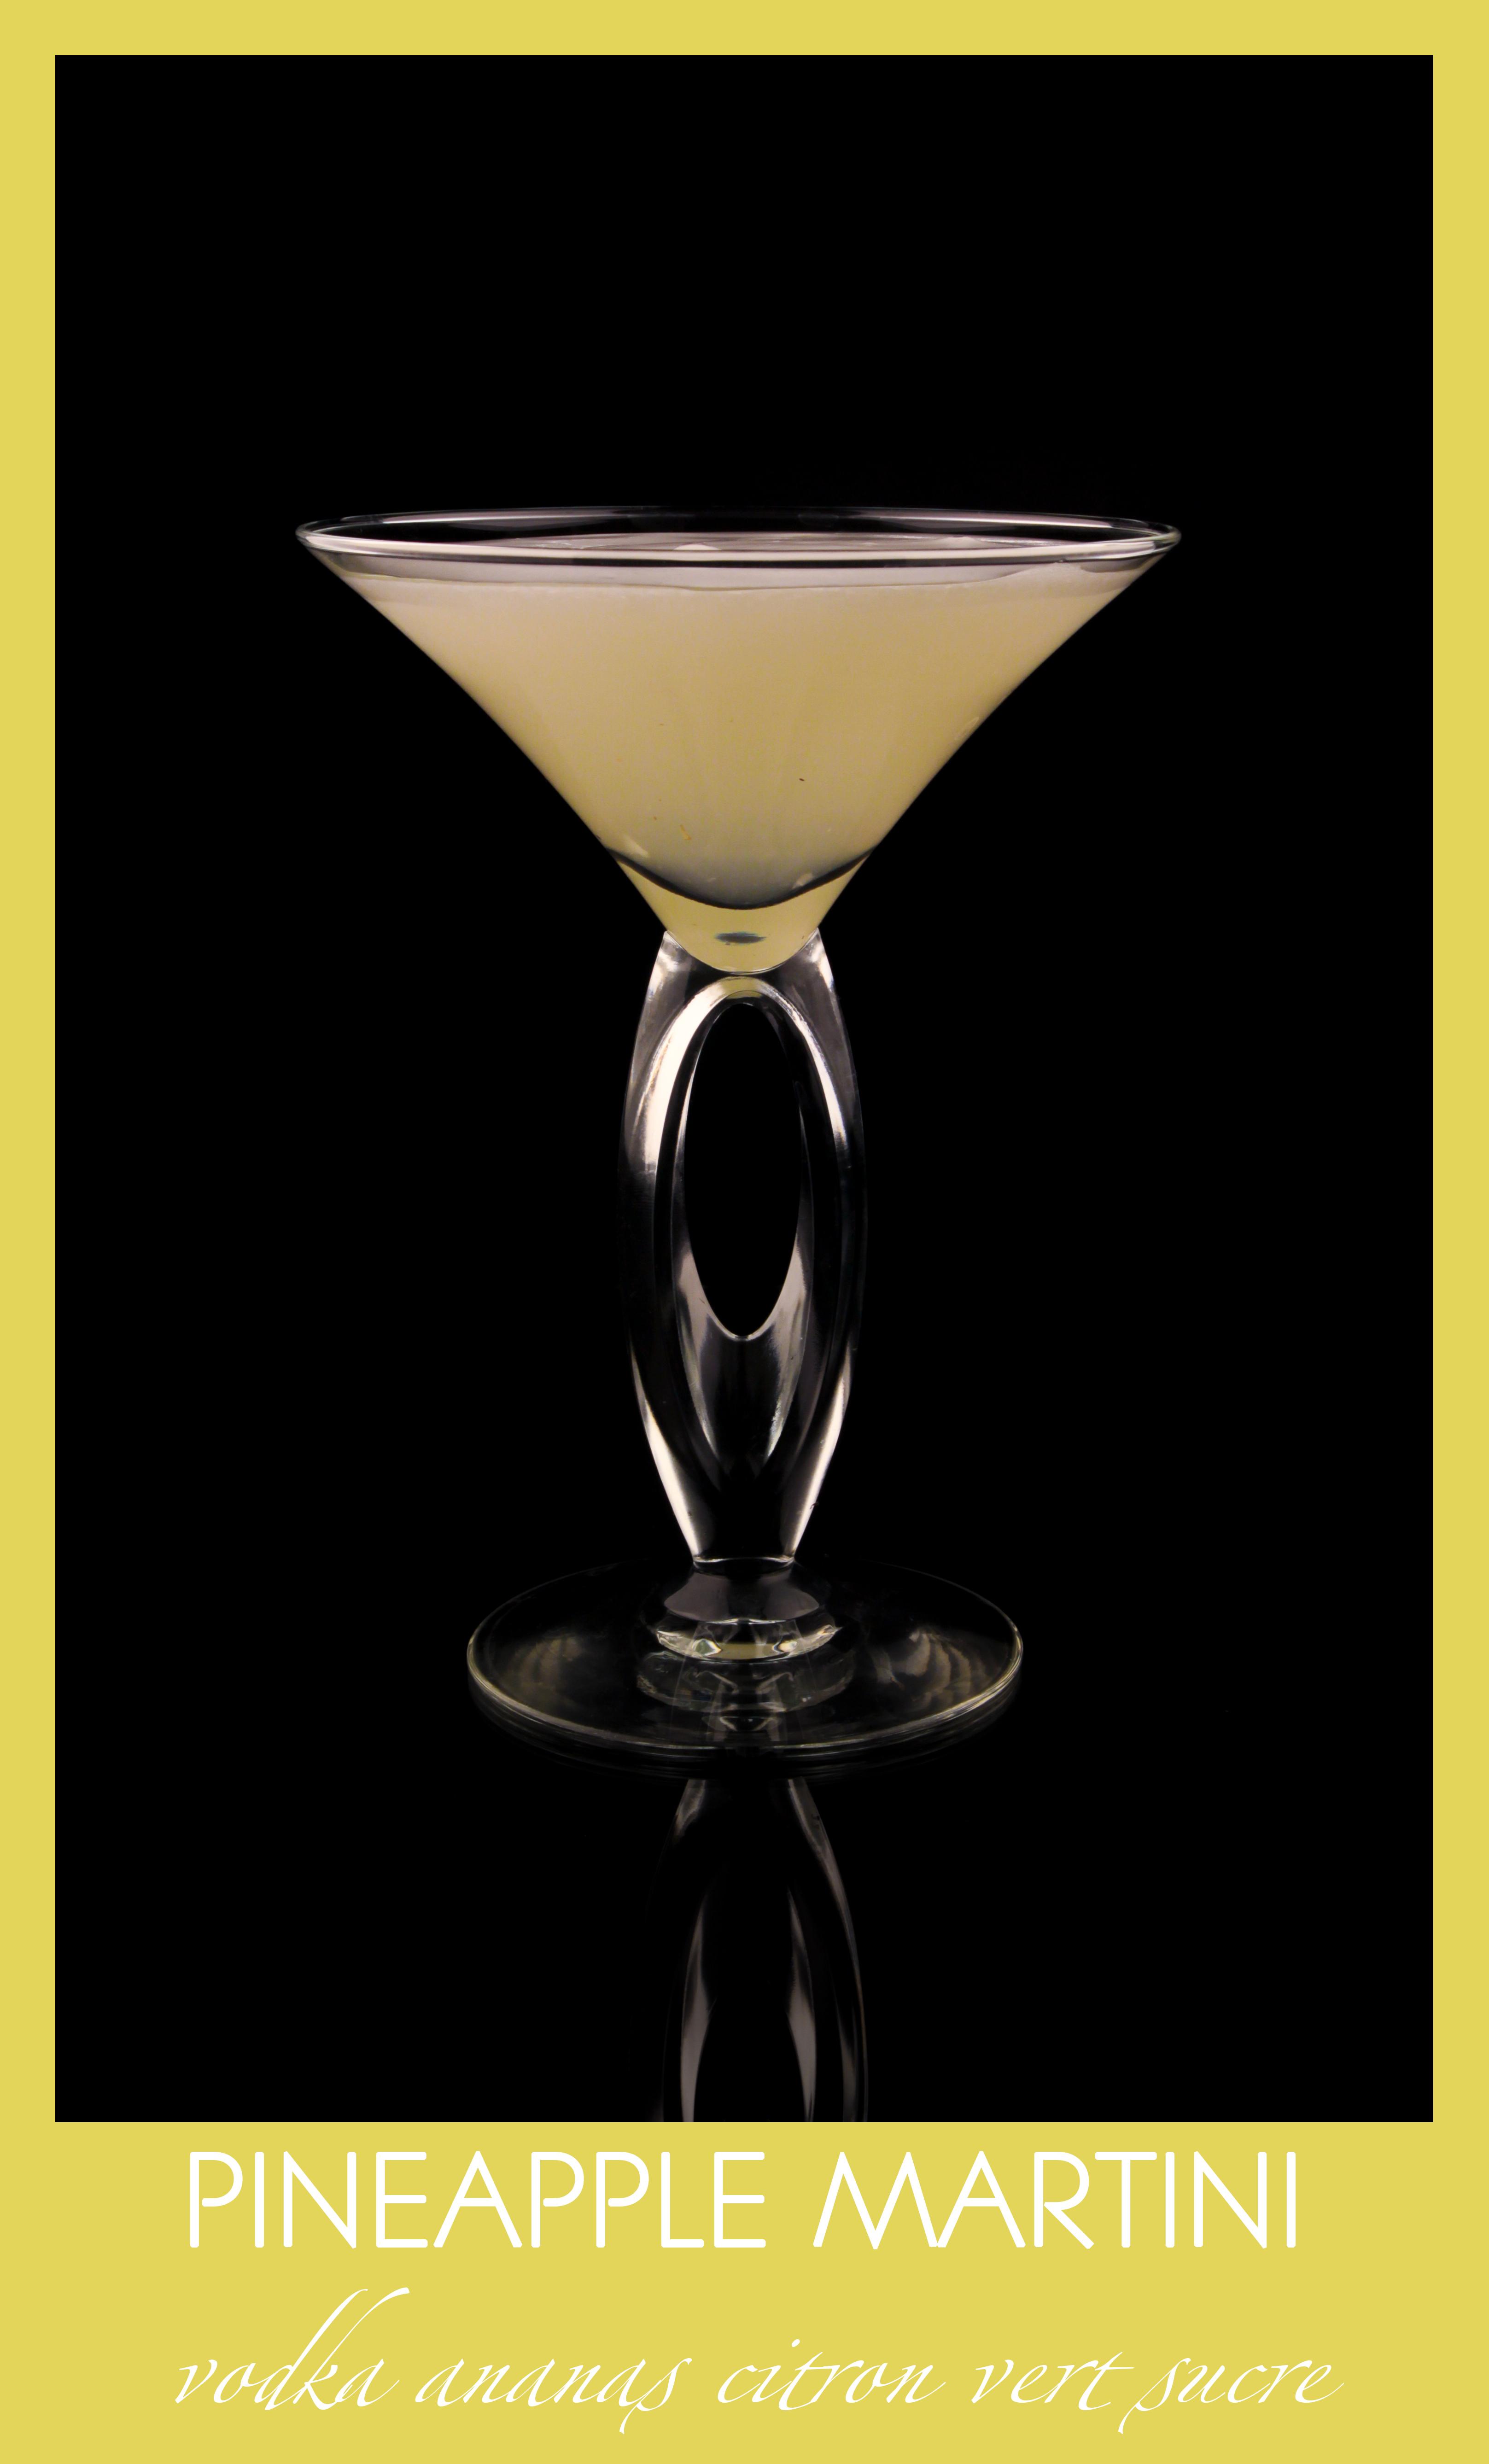 Pineapple Martini.jpg